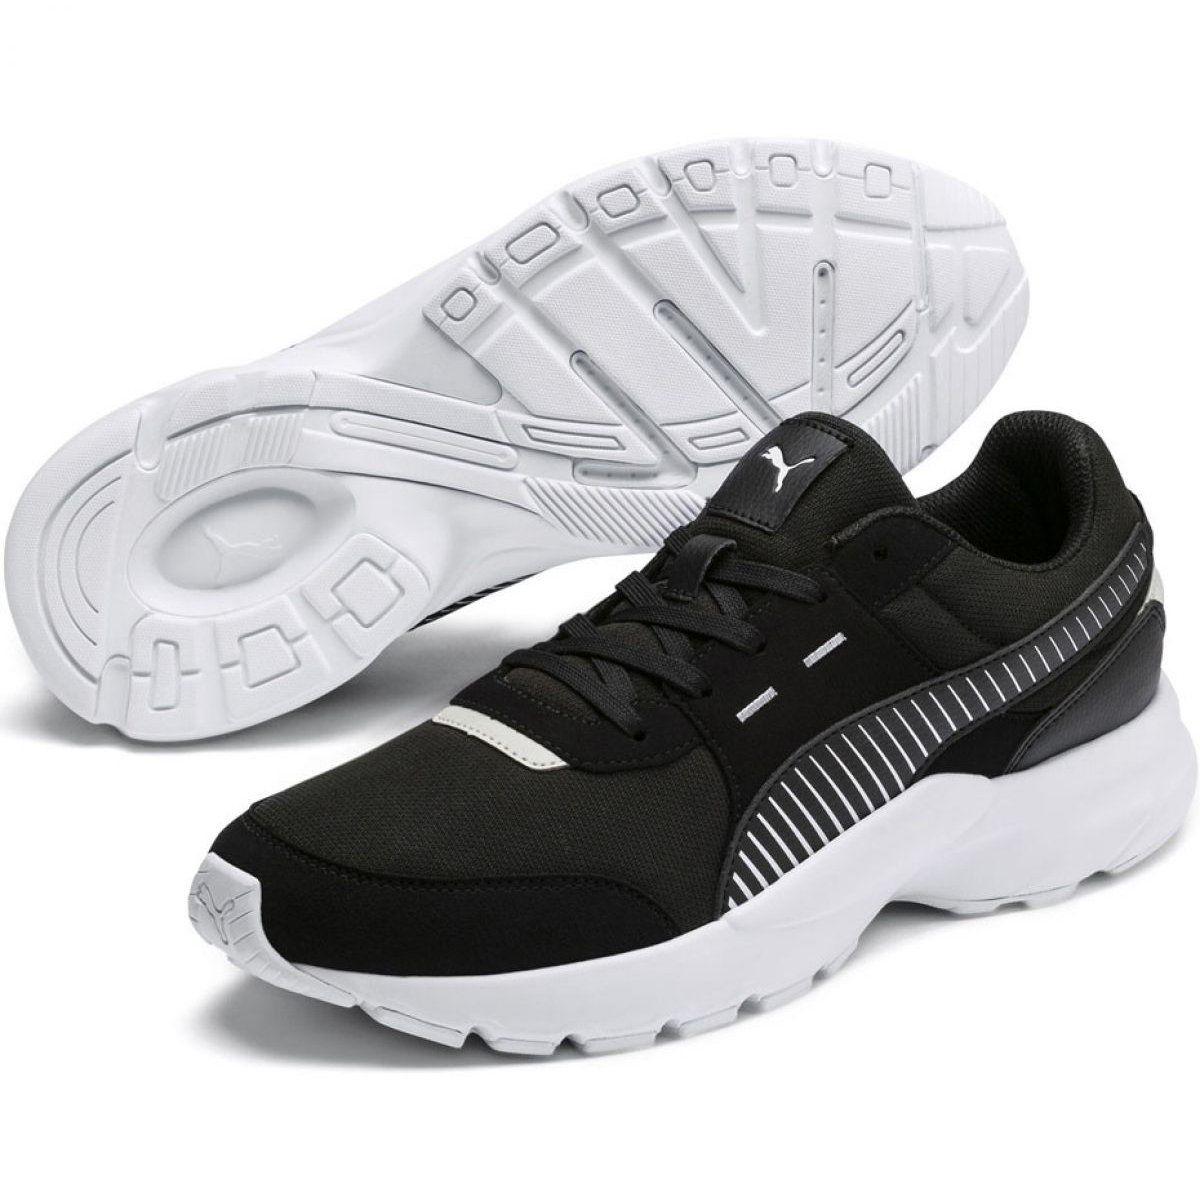 Treningowe Bieganie Sport Puma Czarne Buty Biegowe Puma Future Runner M 368035 01 Puma Running Shoes Running Shoes Design Running Shoes